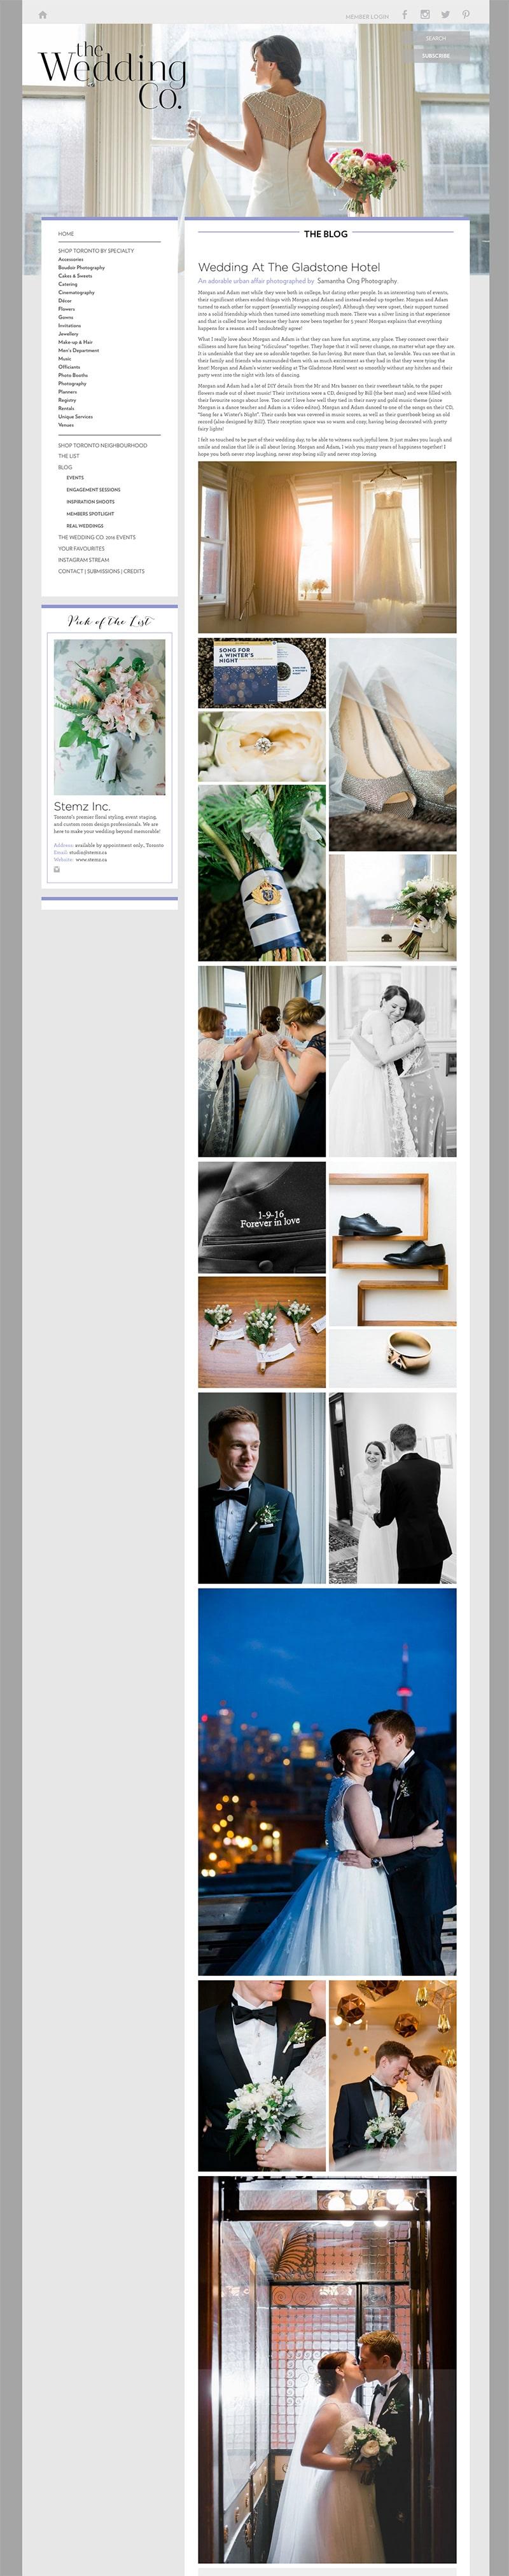 theweddingco-wedding-gladstone-hotel-winter-photos